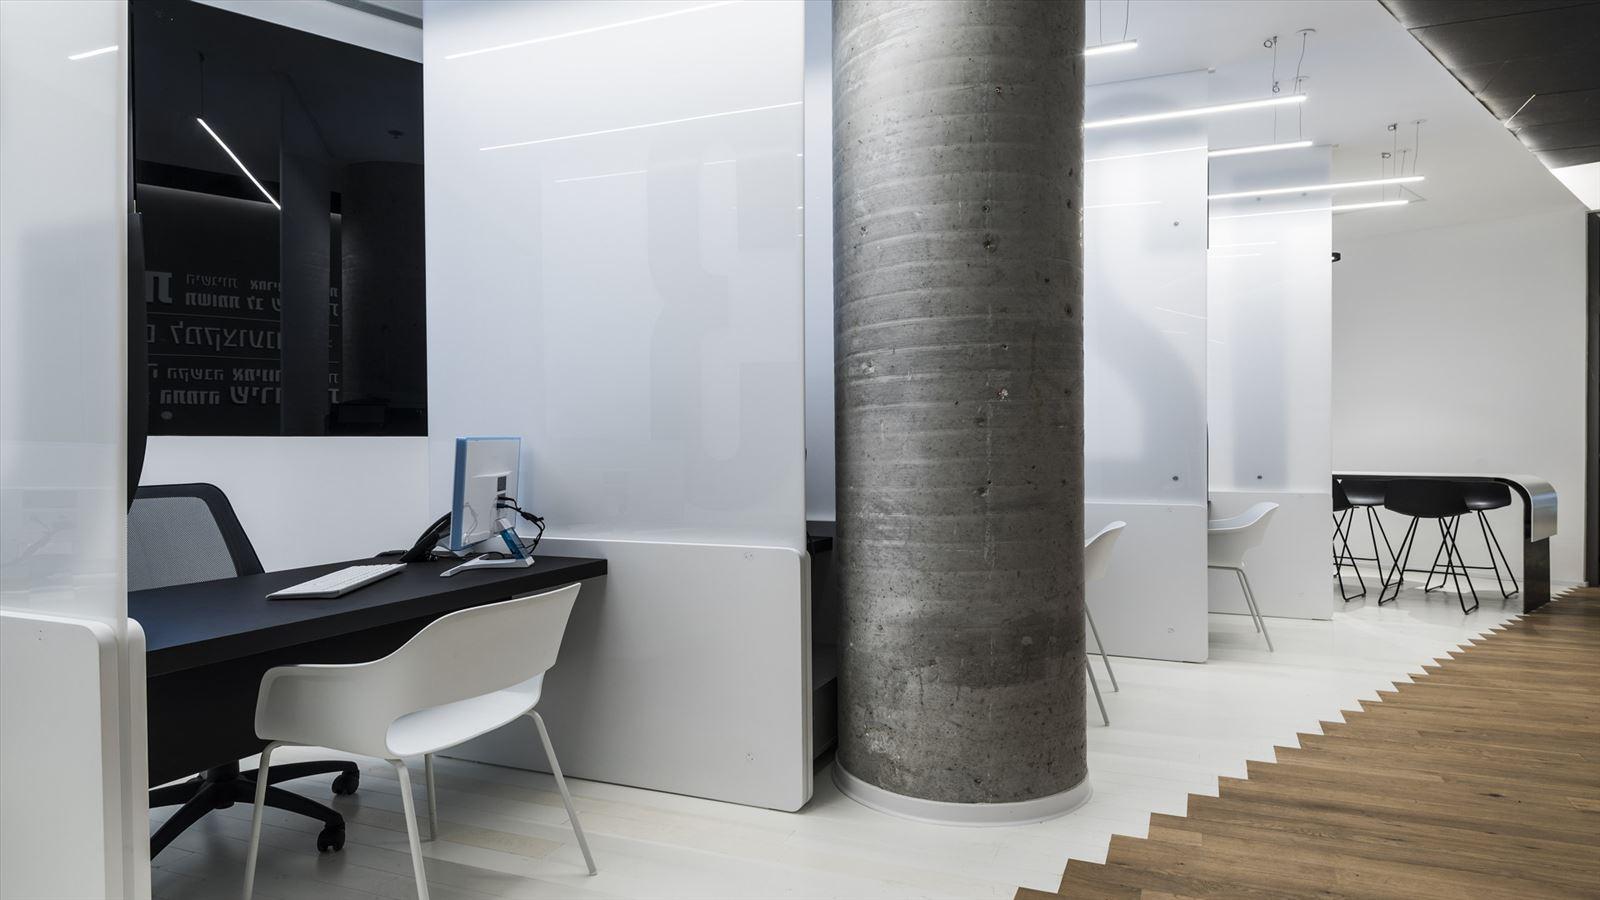 Office lighting project גופי תאורה במשרד על ידי דורי קמחי